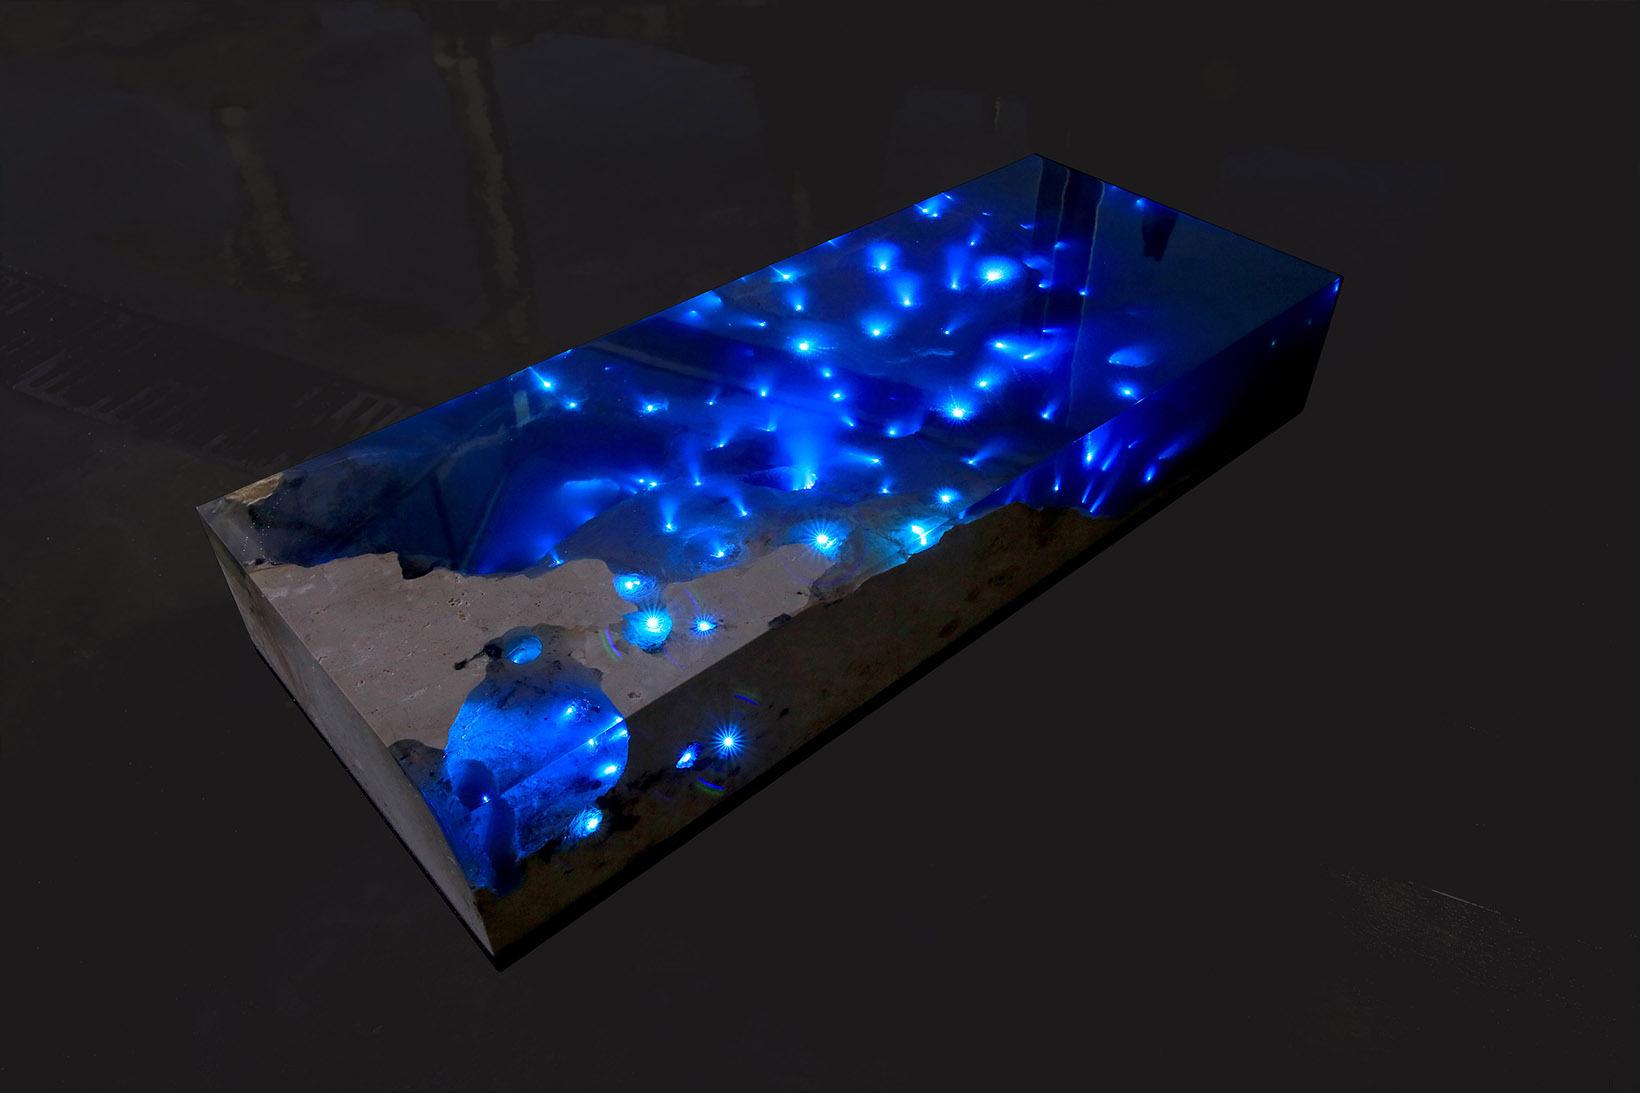 LA TABLE Александра Шапелина возвращаются в итерации «Звёздное море»